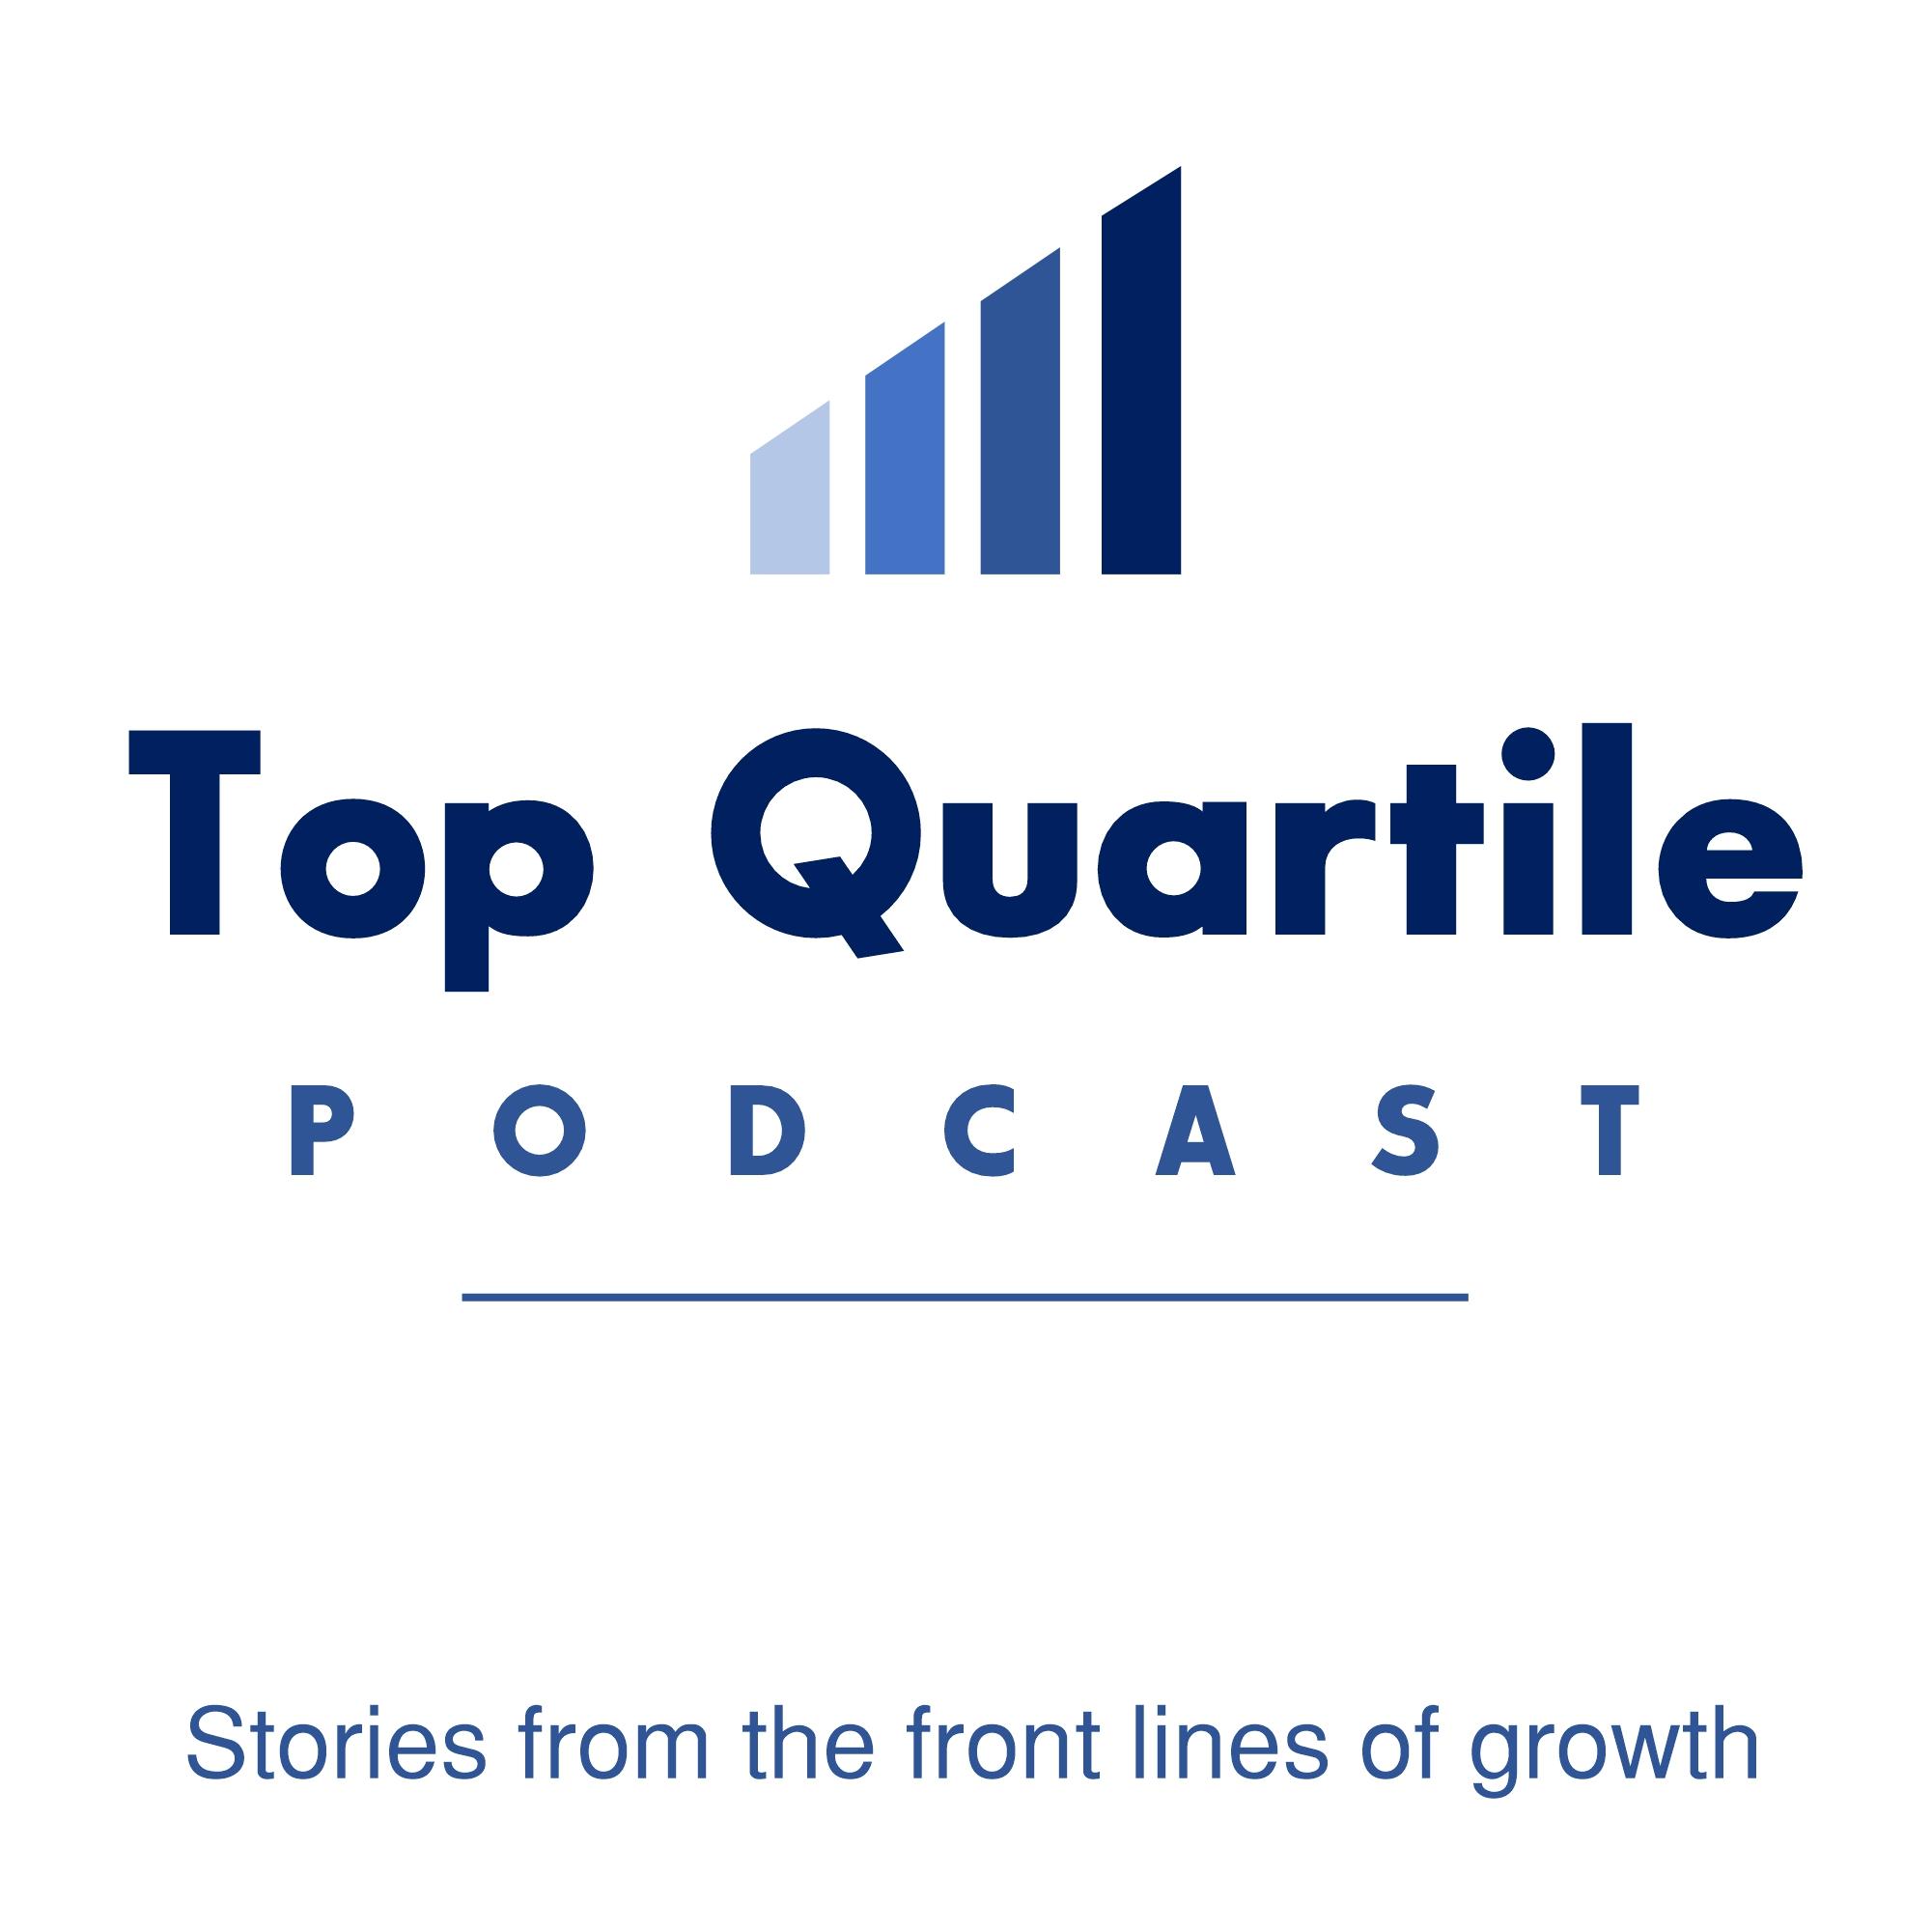 Top Quartile